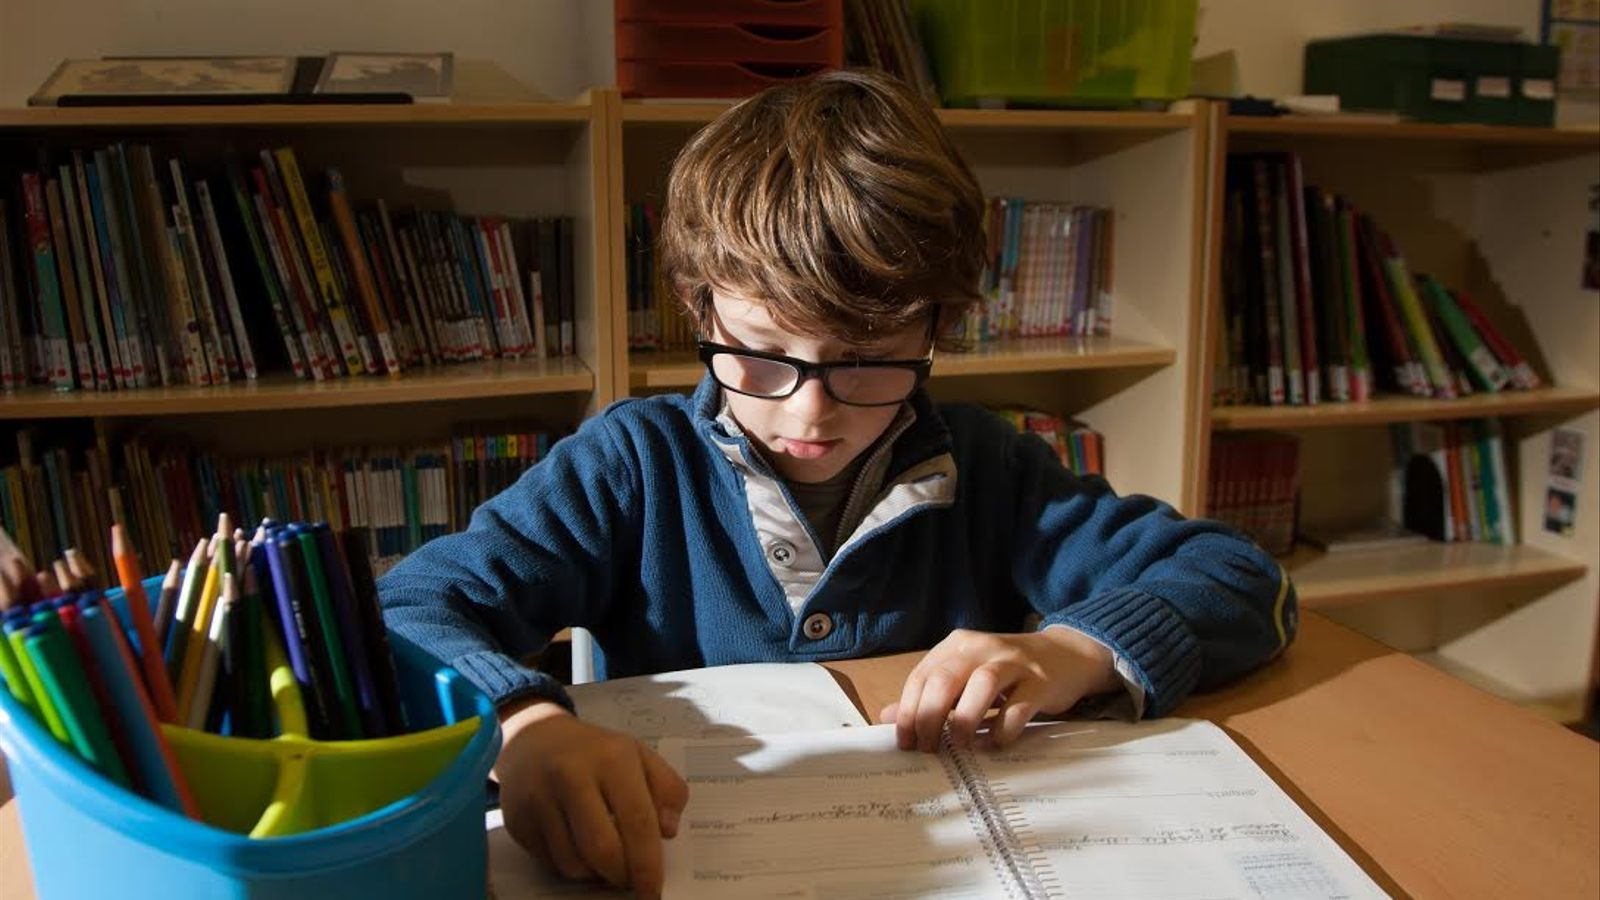 Extended school days for homework help